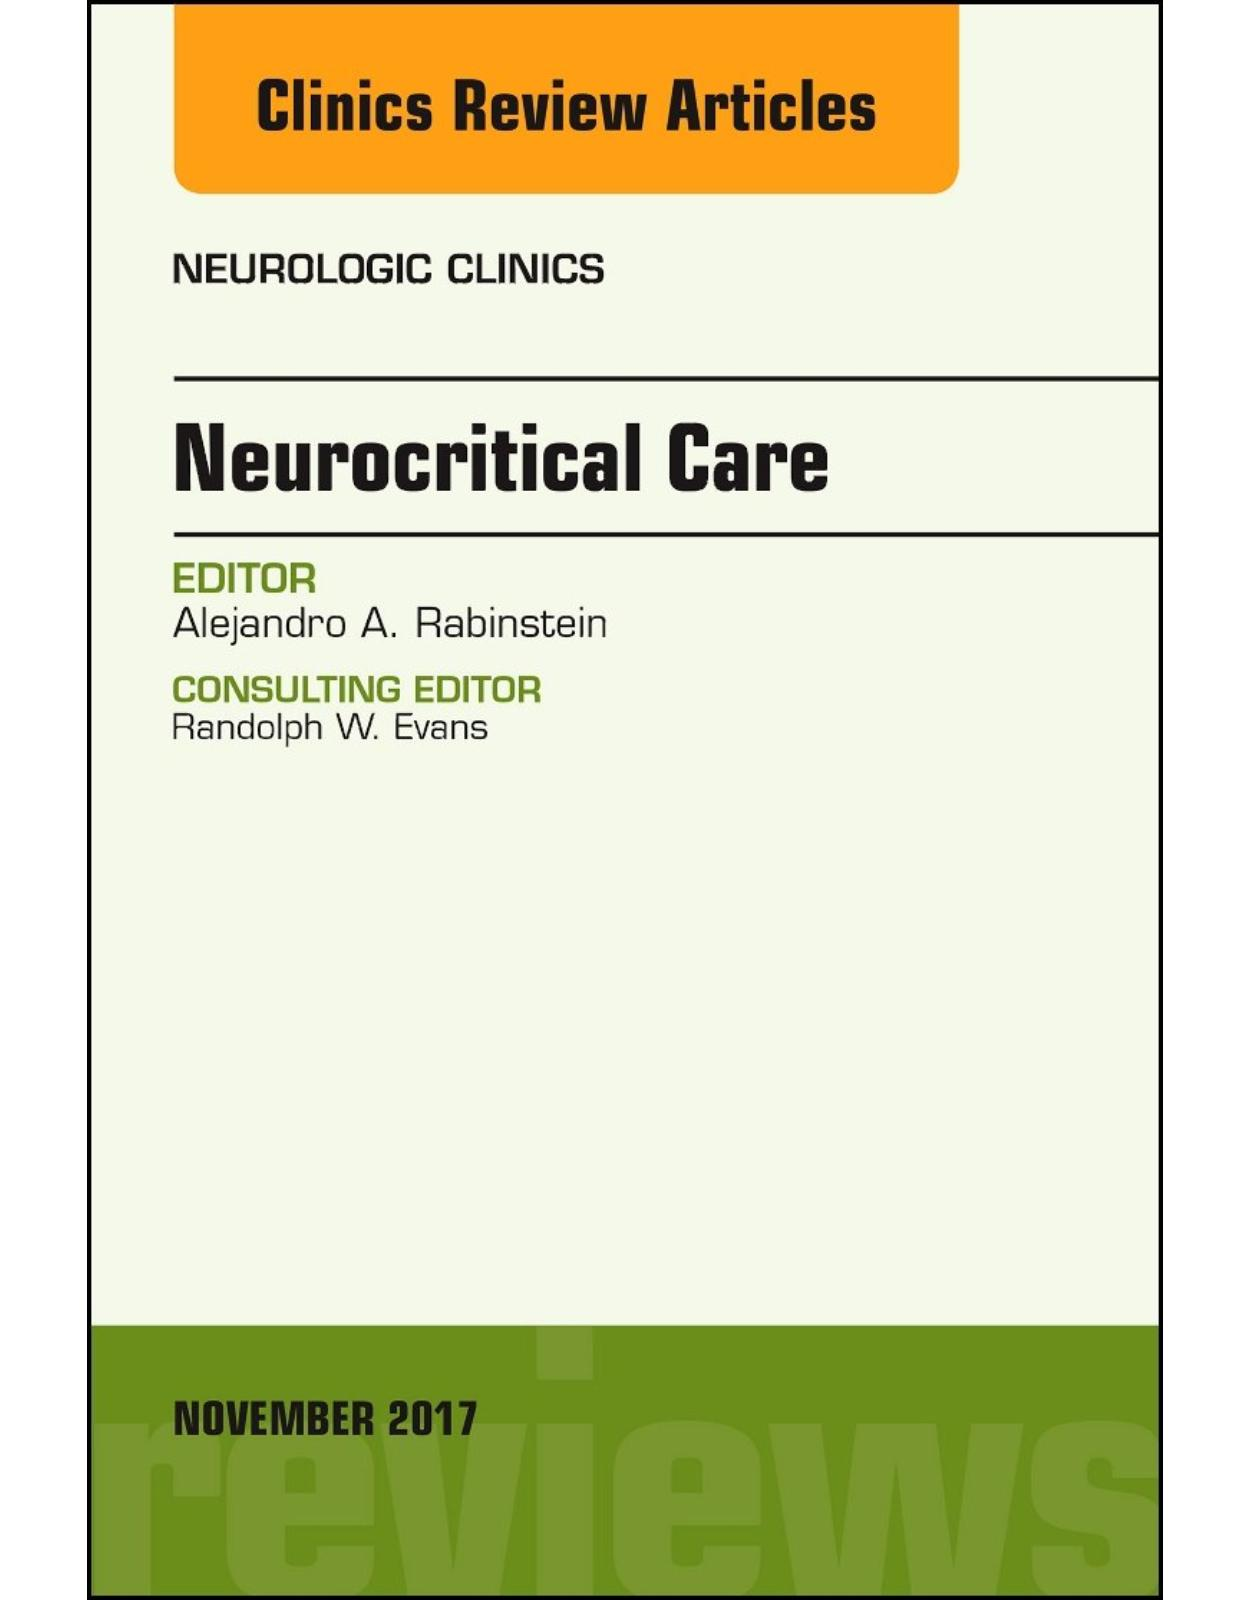 Neurocritical Care, An Issue of Neurologic Clinics, Volume 35-4